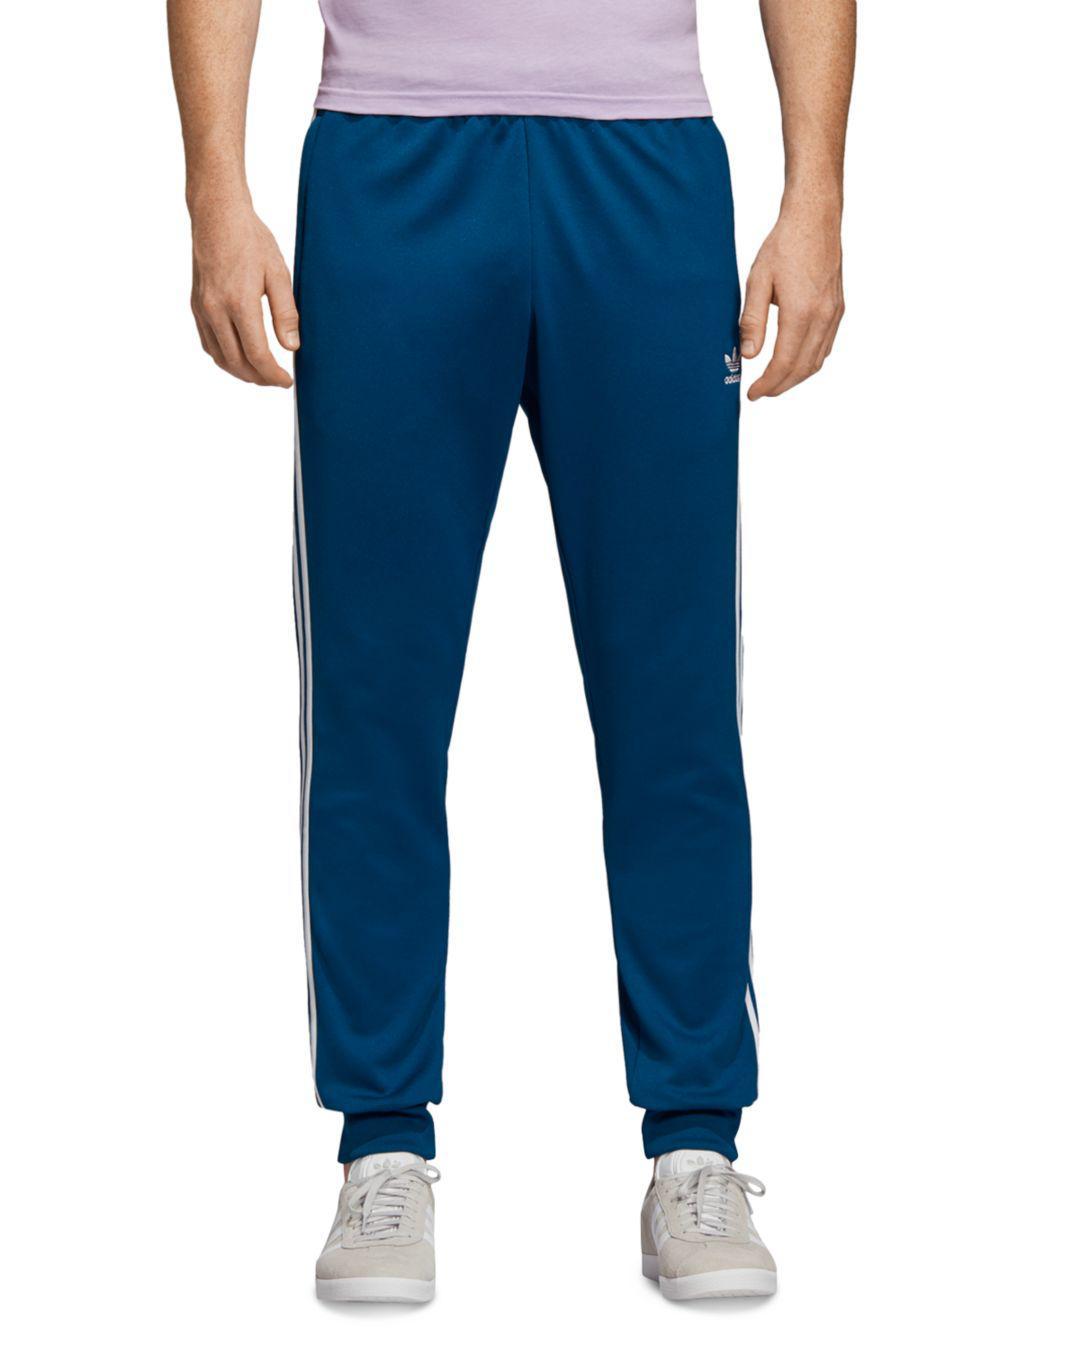 on sale 185bd eb4ae adidas Originals. Mens Blue Superstar Track Trousers